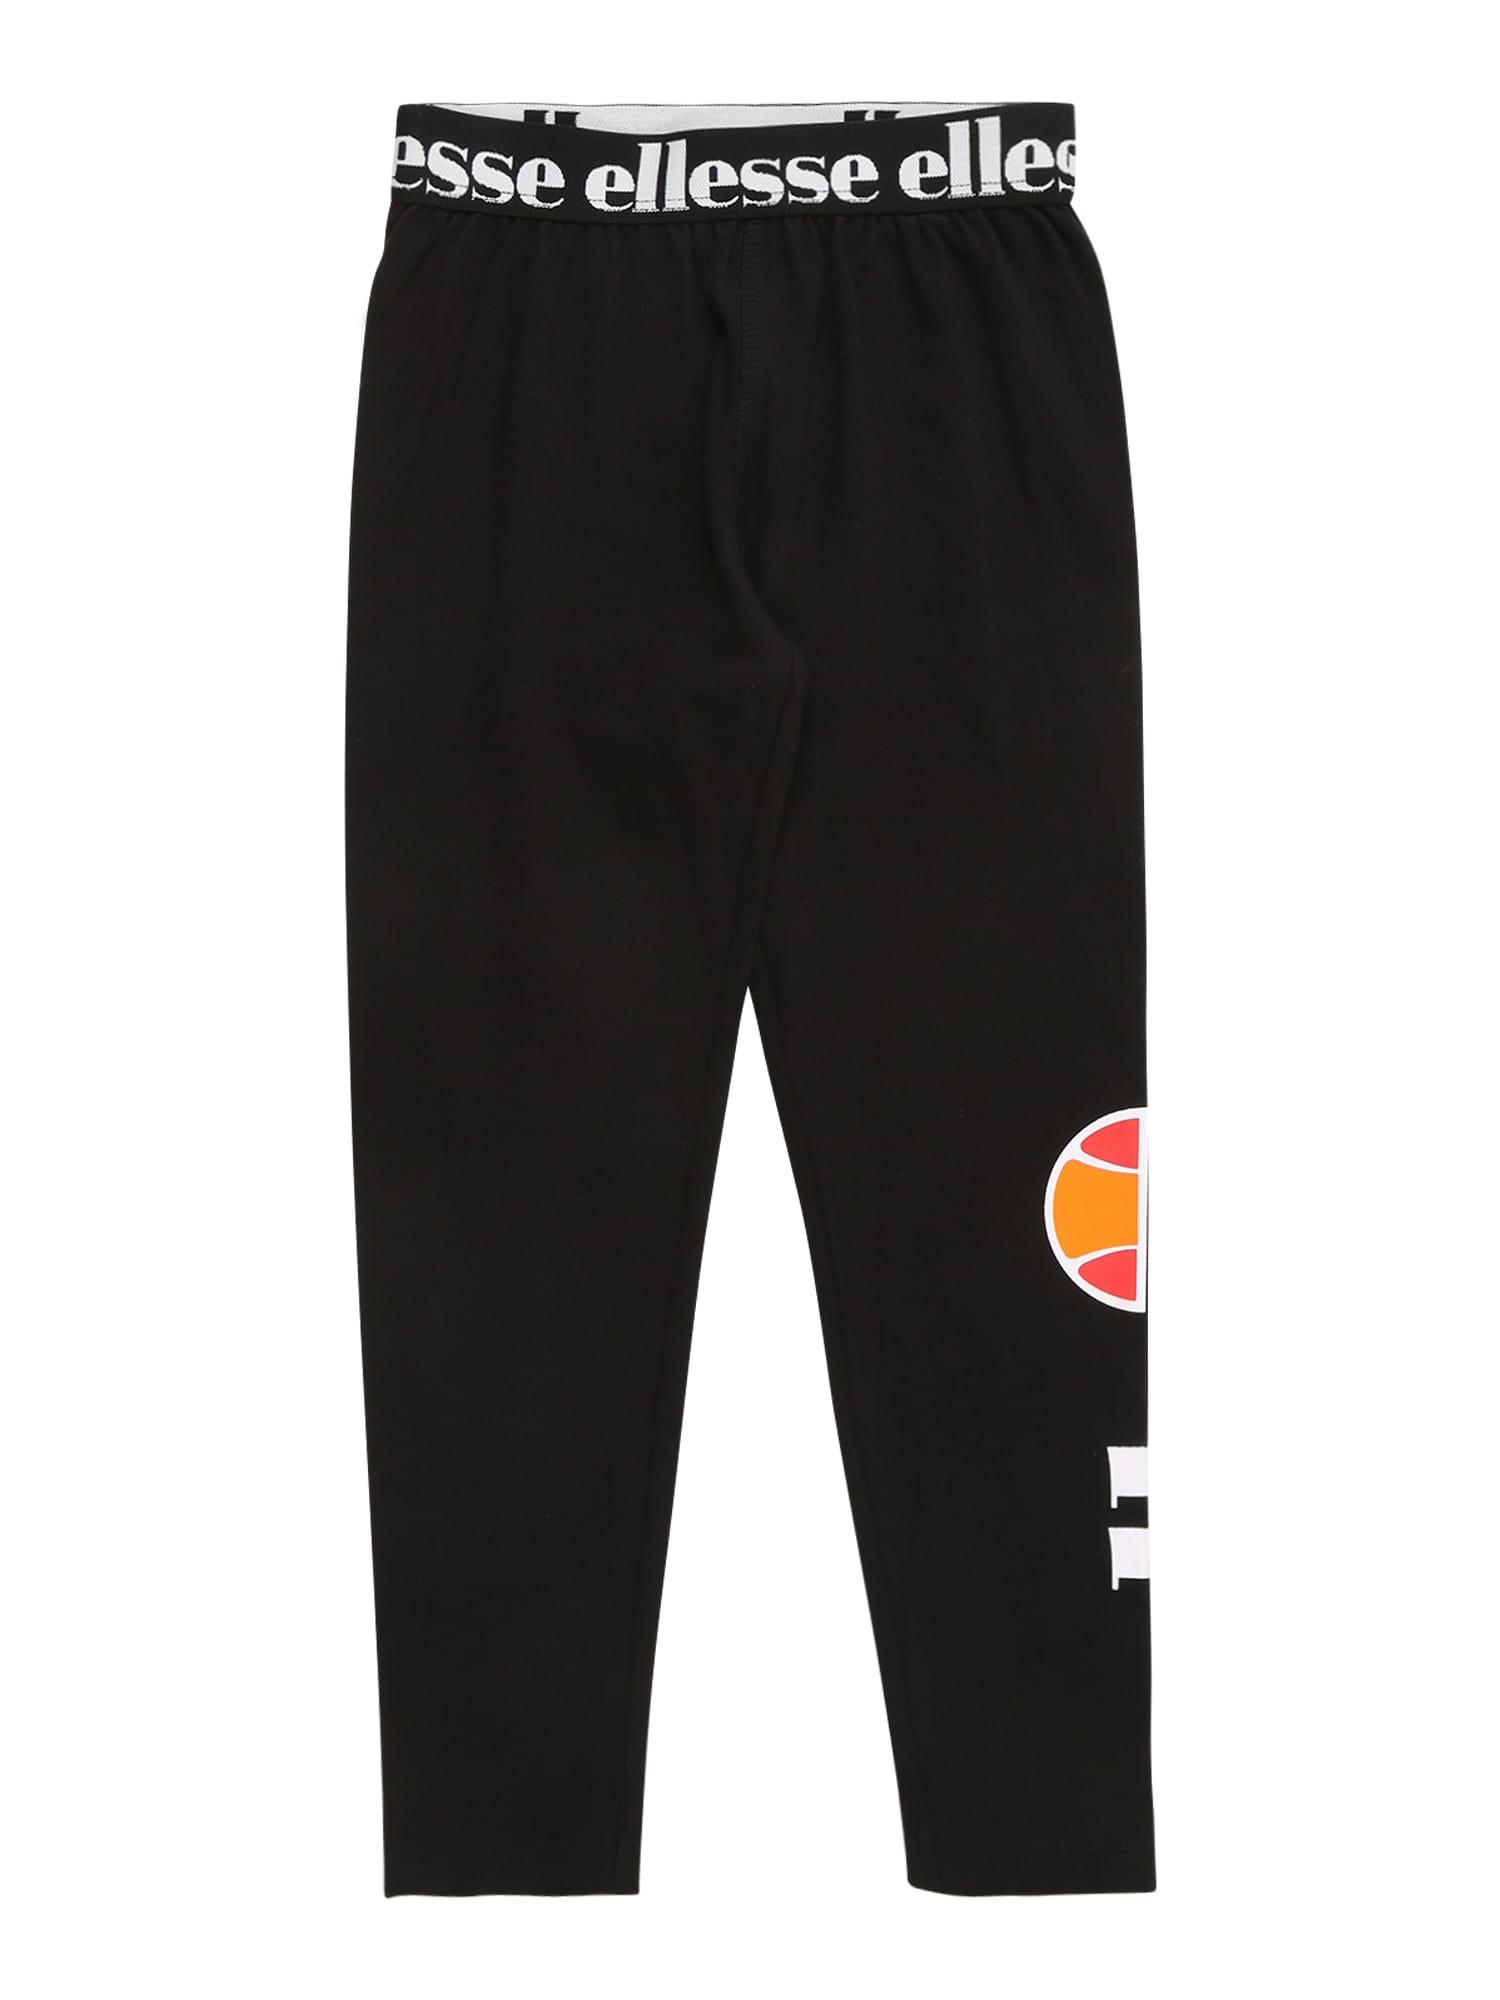 ELLESSE Kelnės 'Fabi' juoda / balta / oranžinė